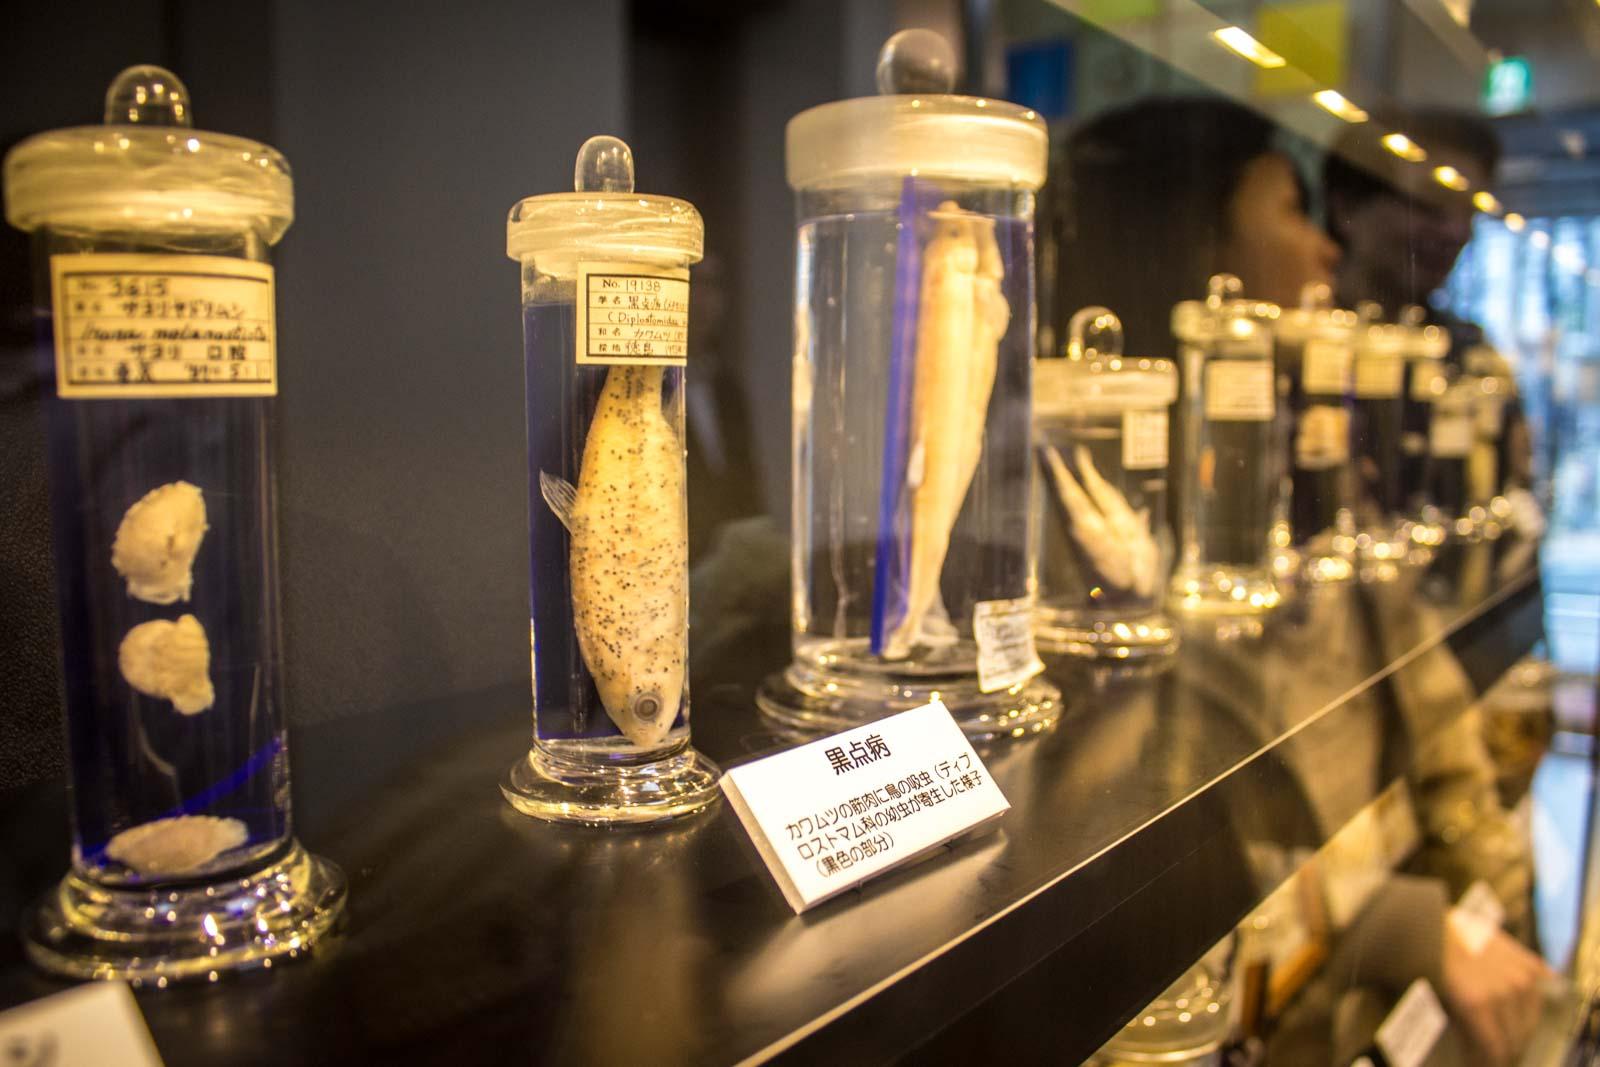 Meguro Parasitological Museum, Tokyo, Japan